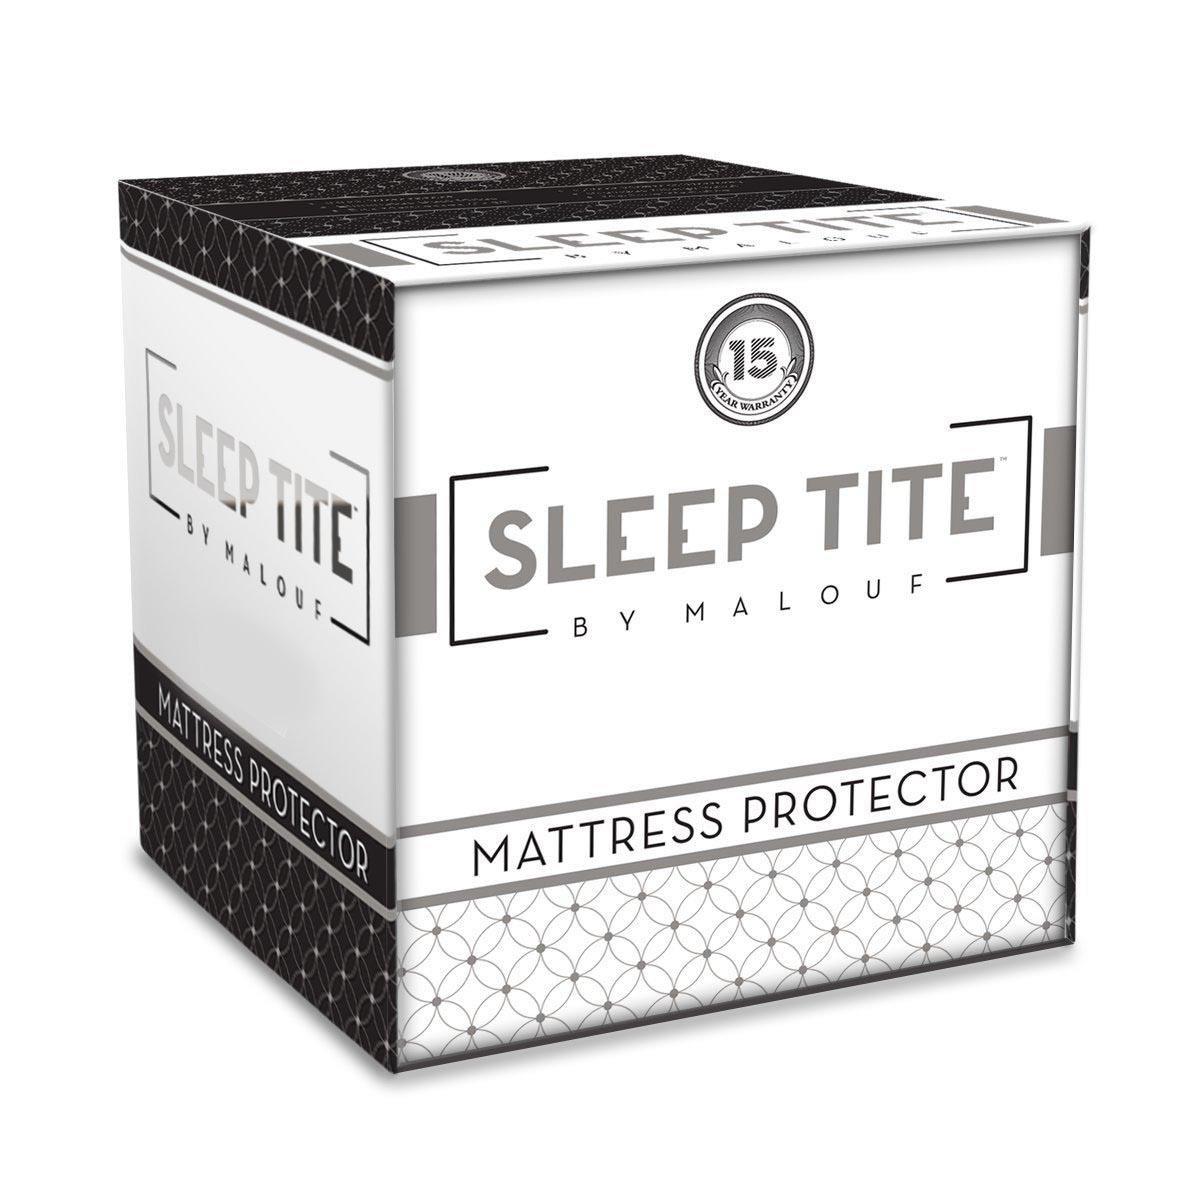 Malouf Mattress Protectors King Mattress Protector - Item Number: SLOOKKMP